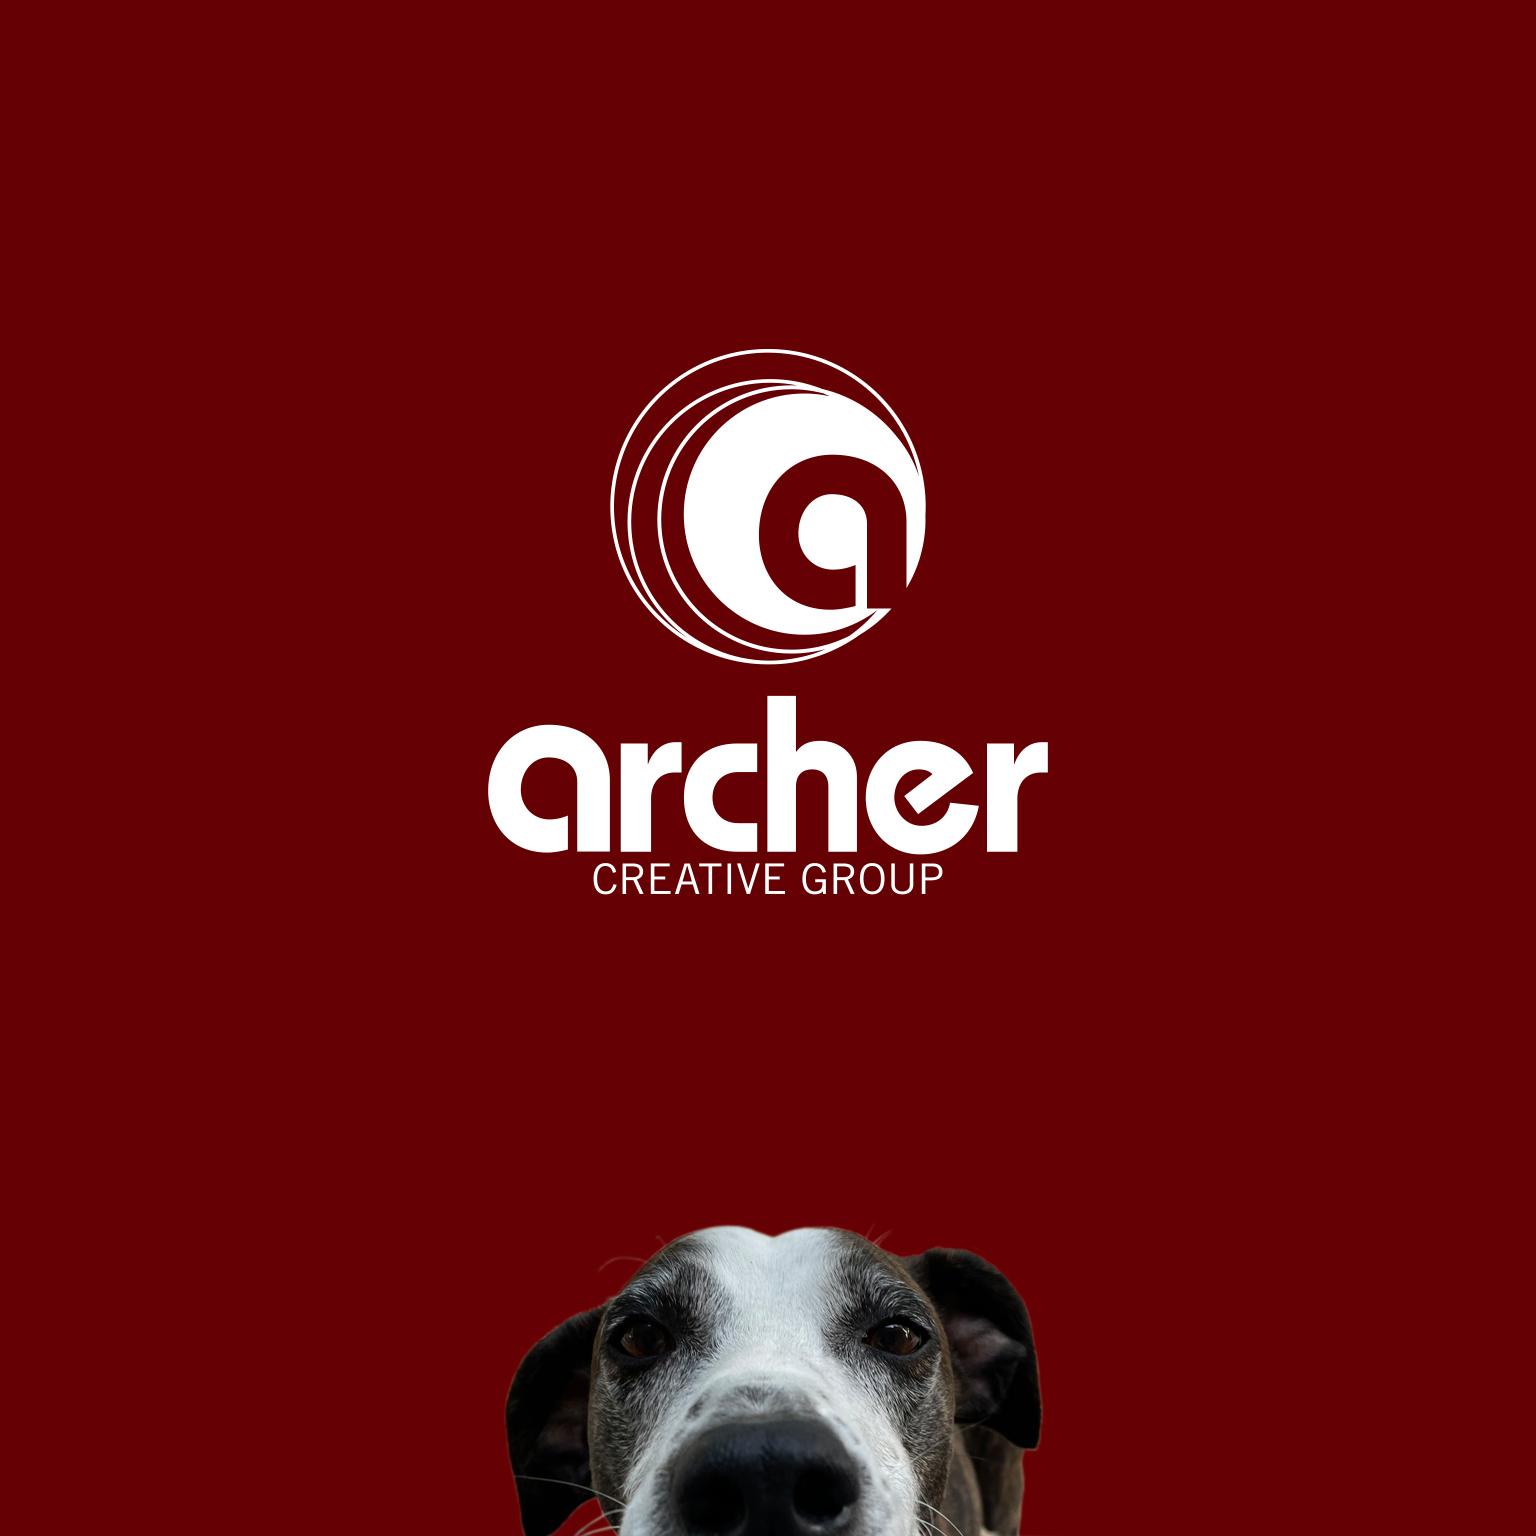 Archer Creative Group 1